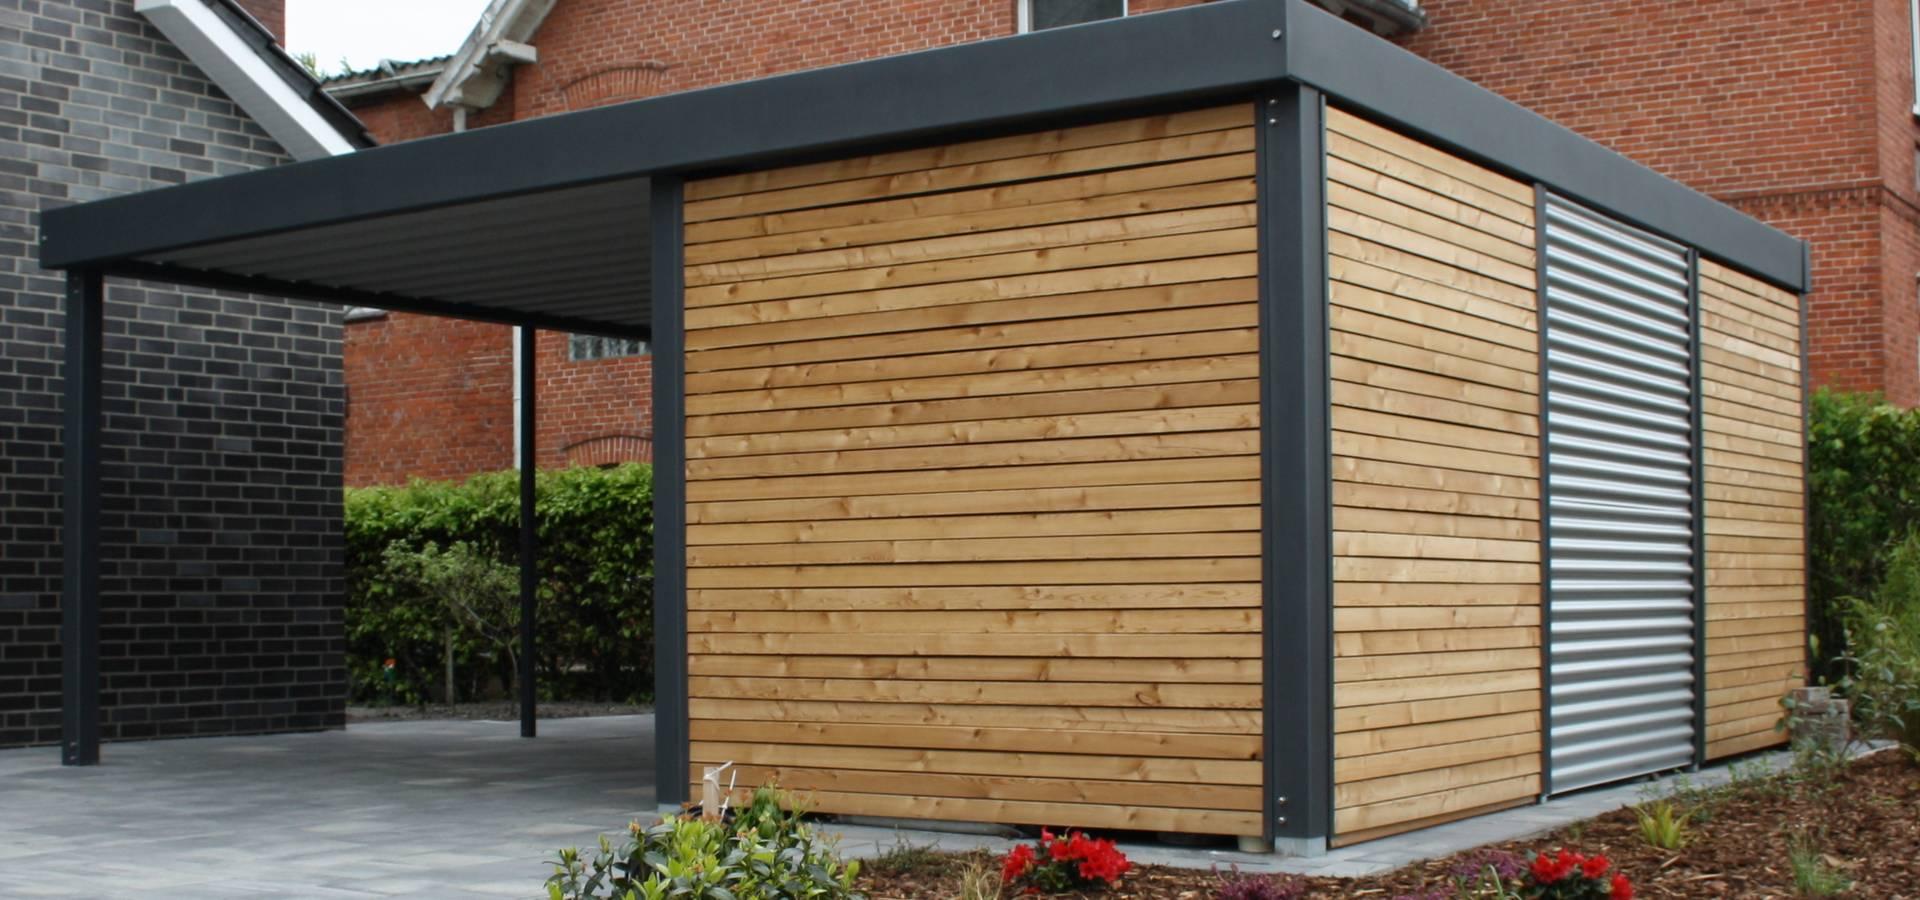 metallcarport mit sichtschutz aus holz de carport schmiede gmbh co kg homify. Black Bedroom Furniture Sets. Home Design Ideas